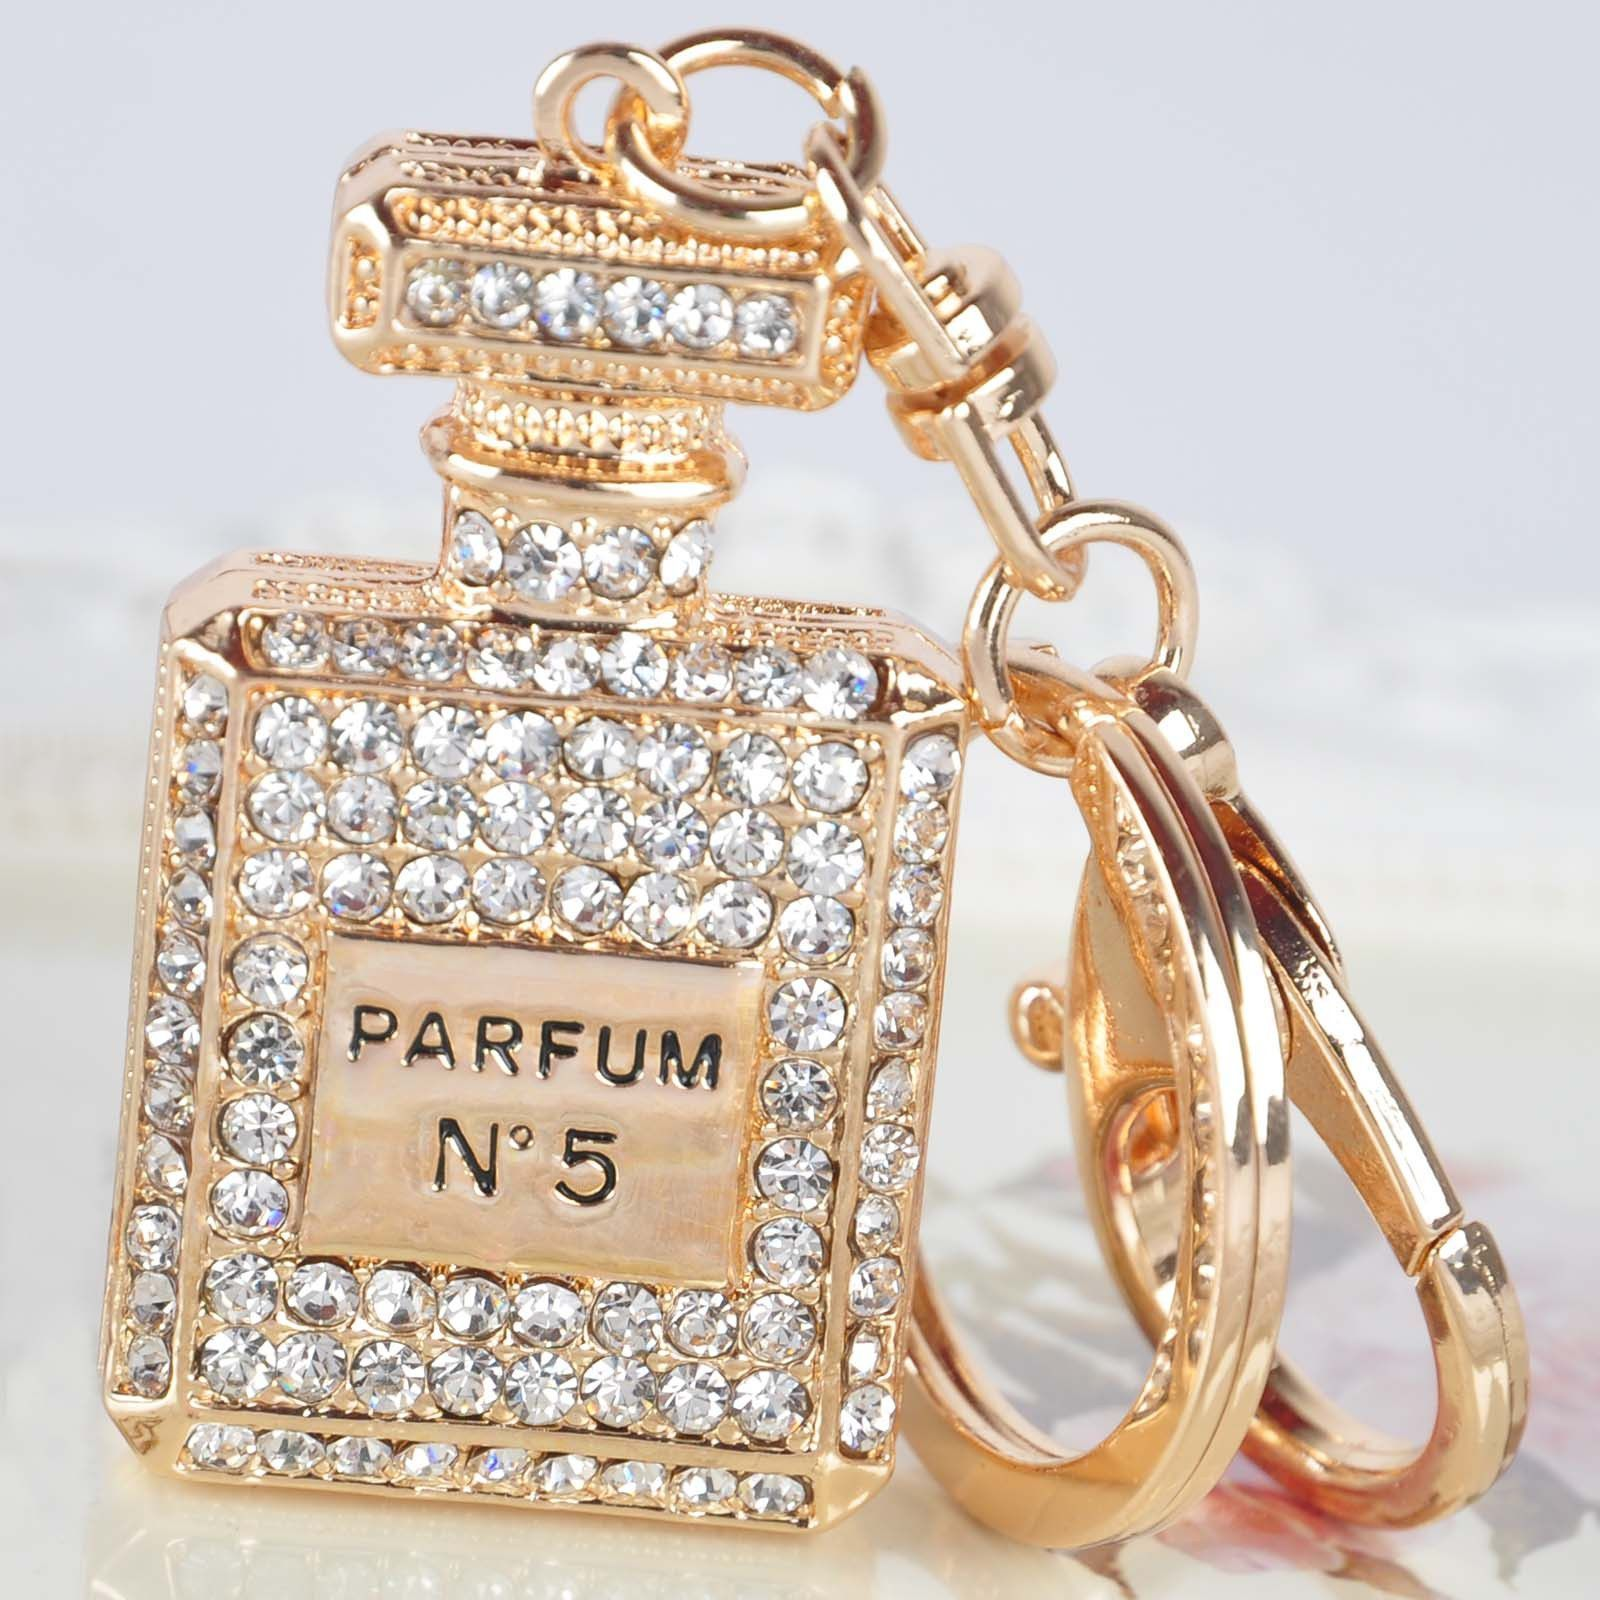 e2b76b79a661 Perfume Charms in 2 Colors   Chanel handbags   Pinterest